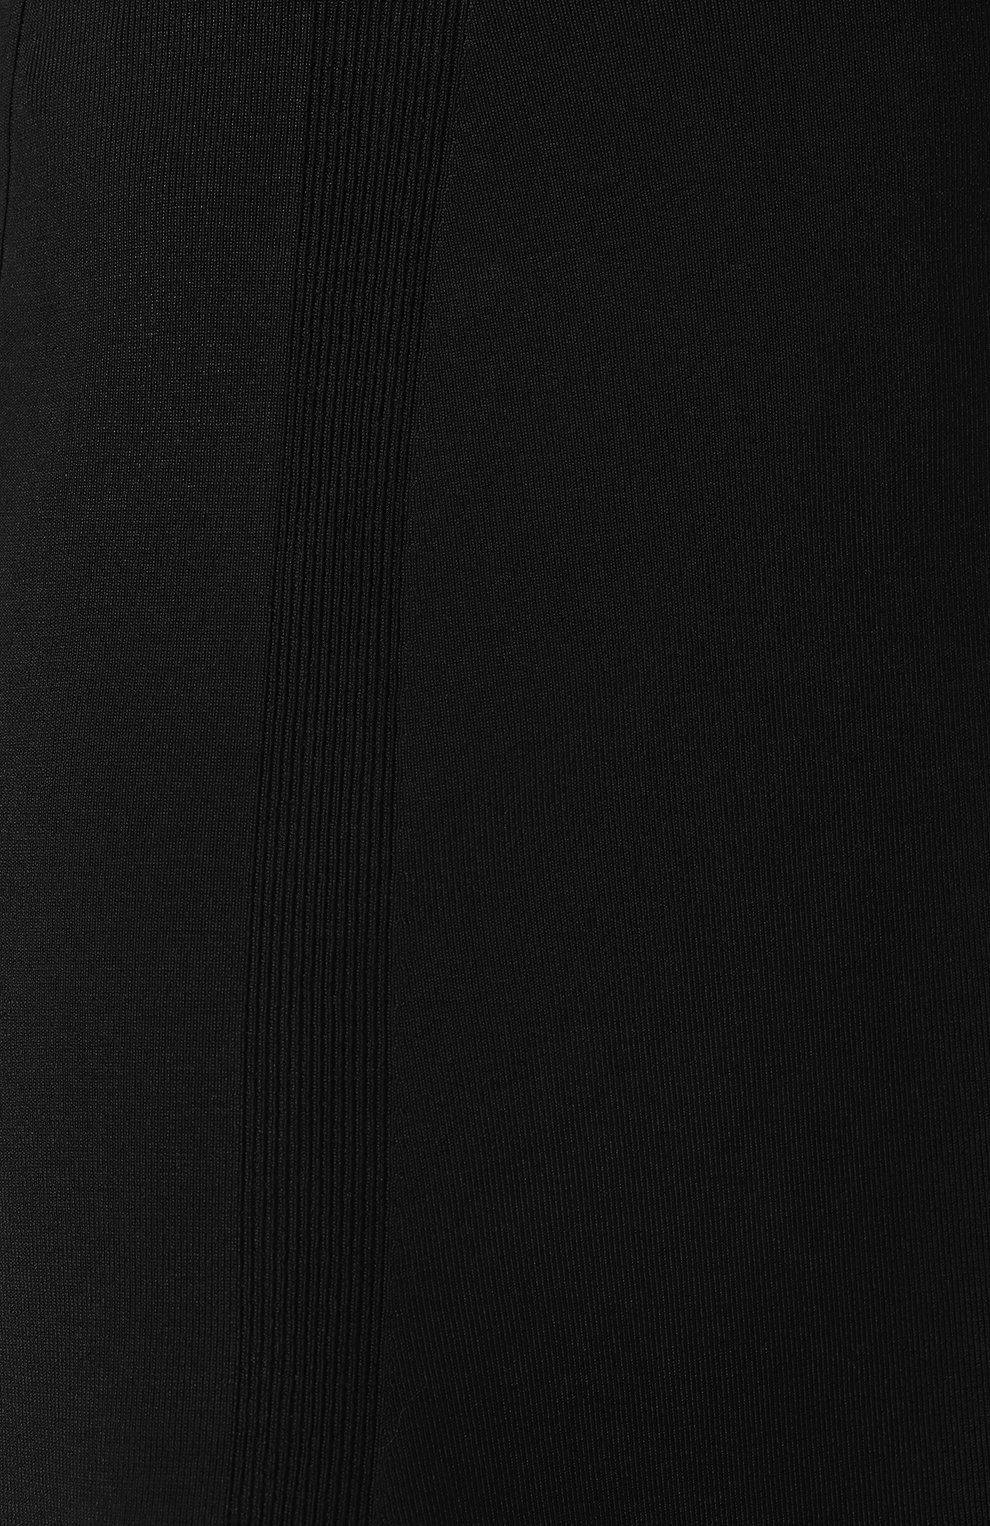 Юбка из вискозы   Фото №5